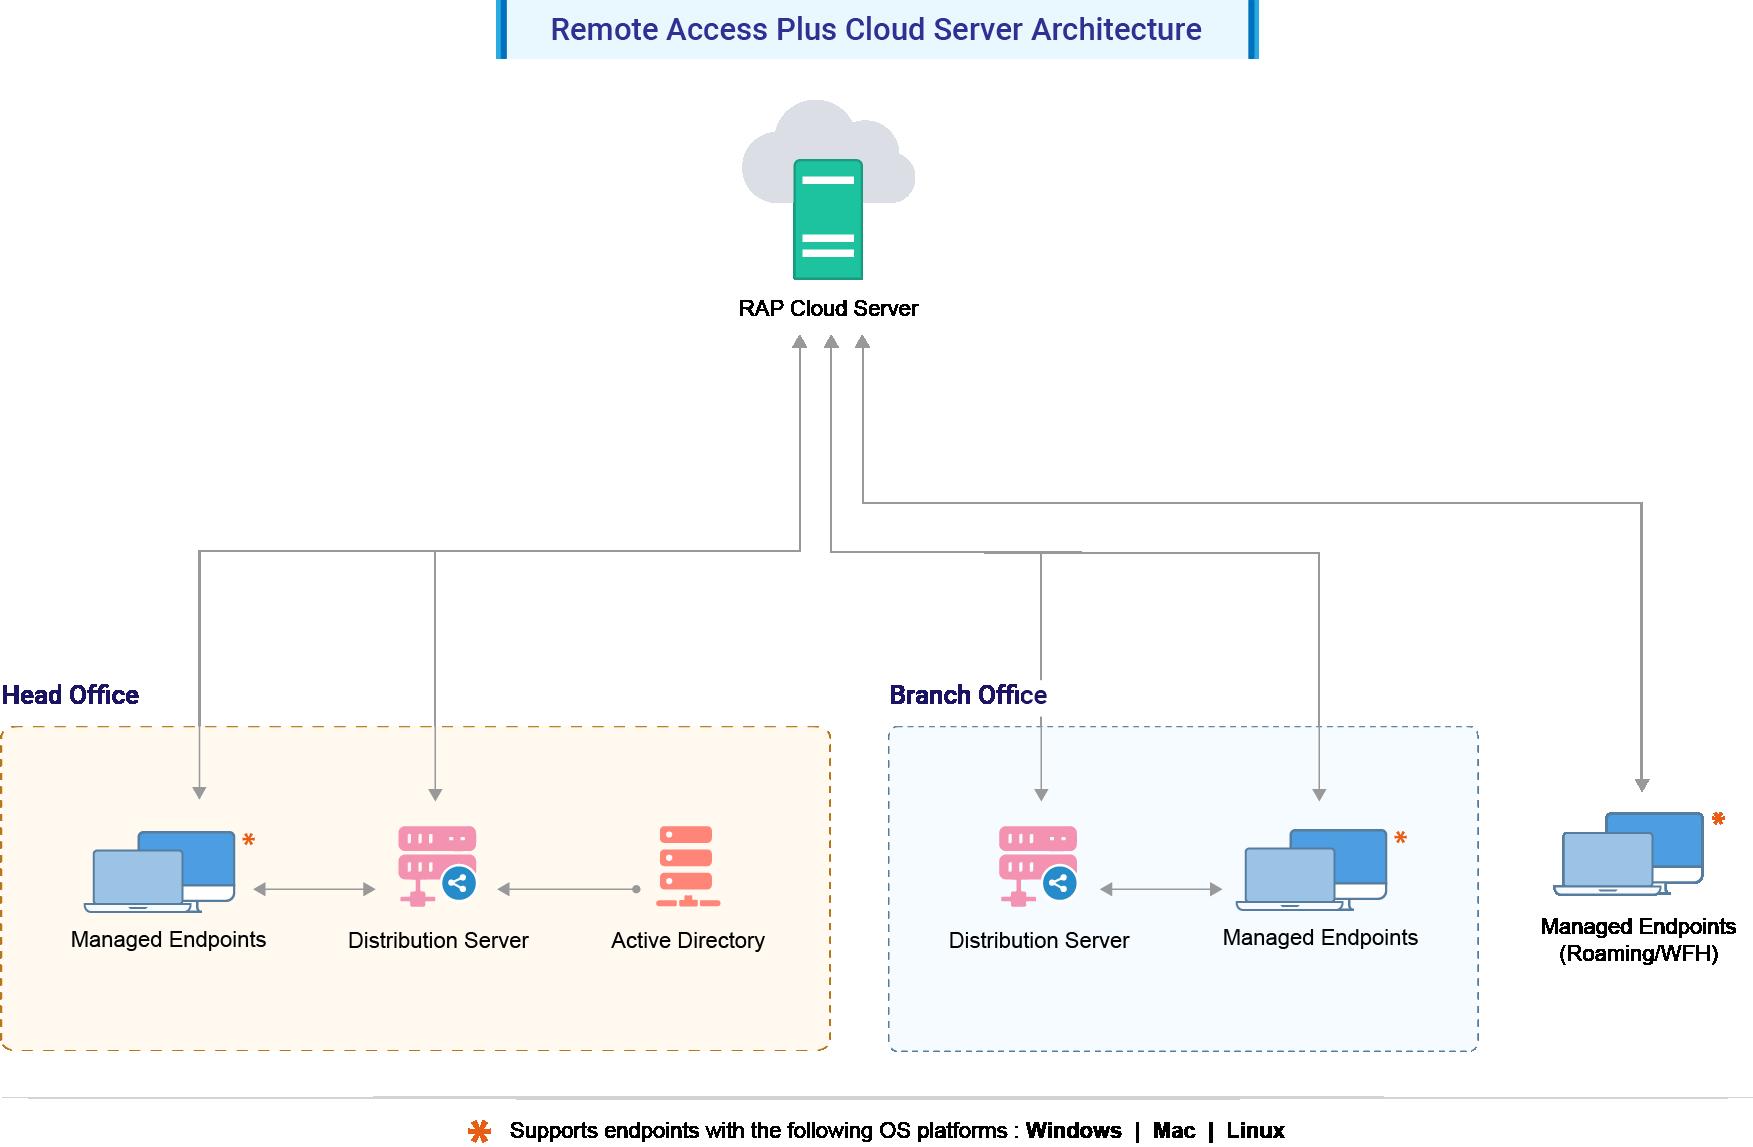 Remote Desktop Management - ManageEngine Remote Access Architecture